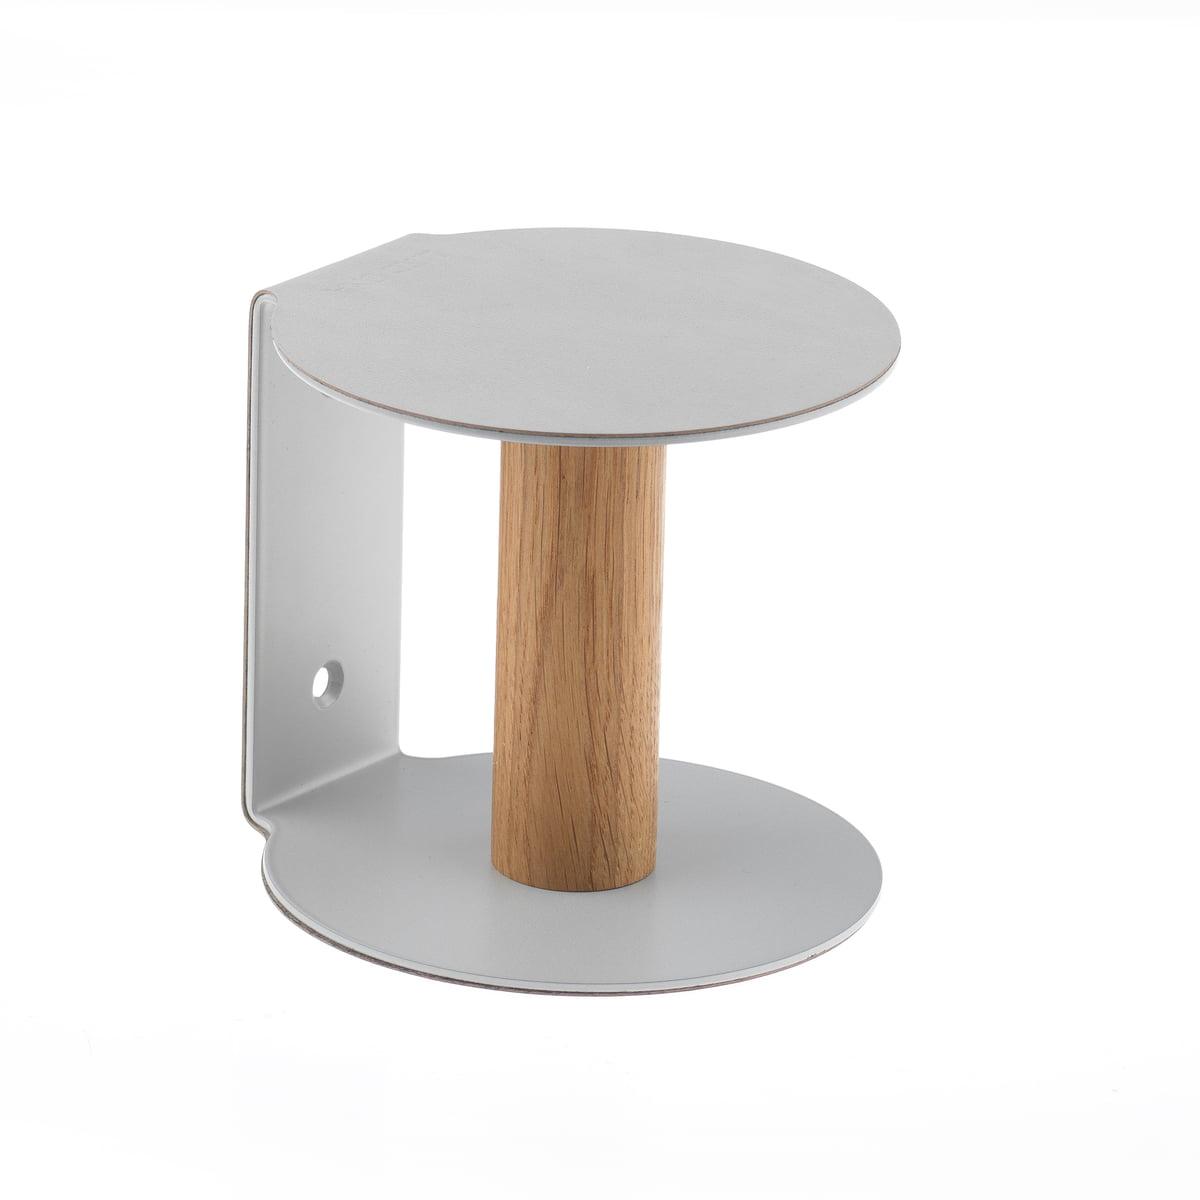 Toilet Paper Holder By LindDNA In Metallic Nupo / Metallic Steel